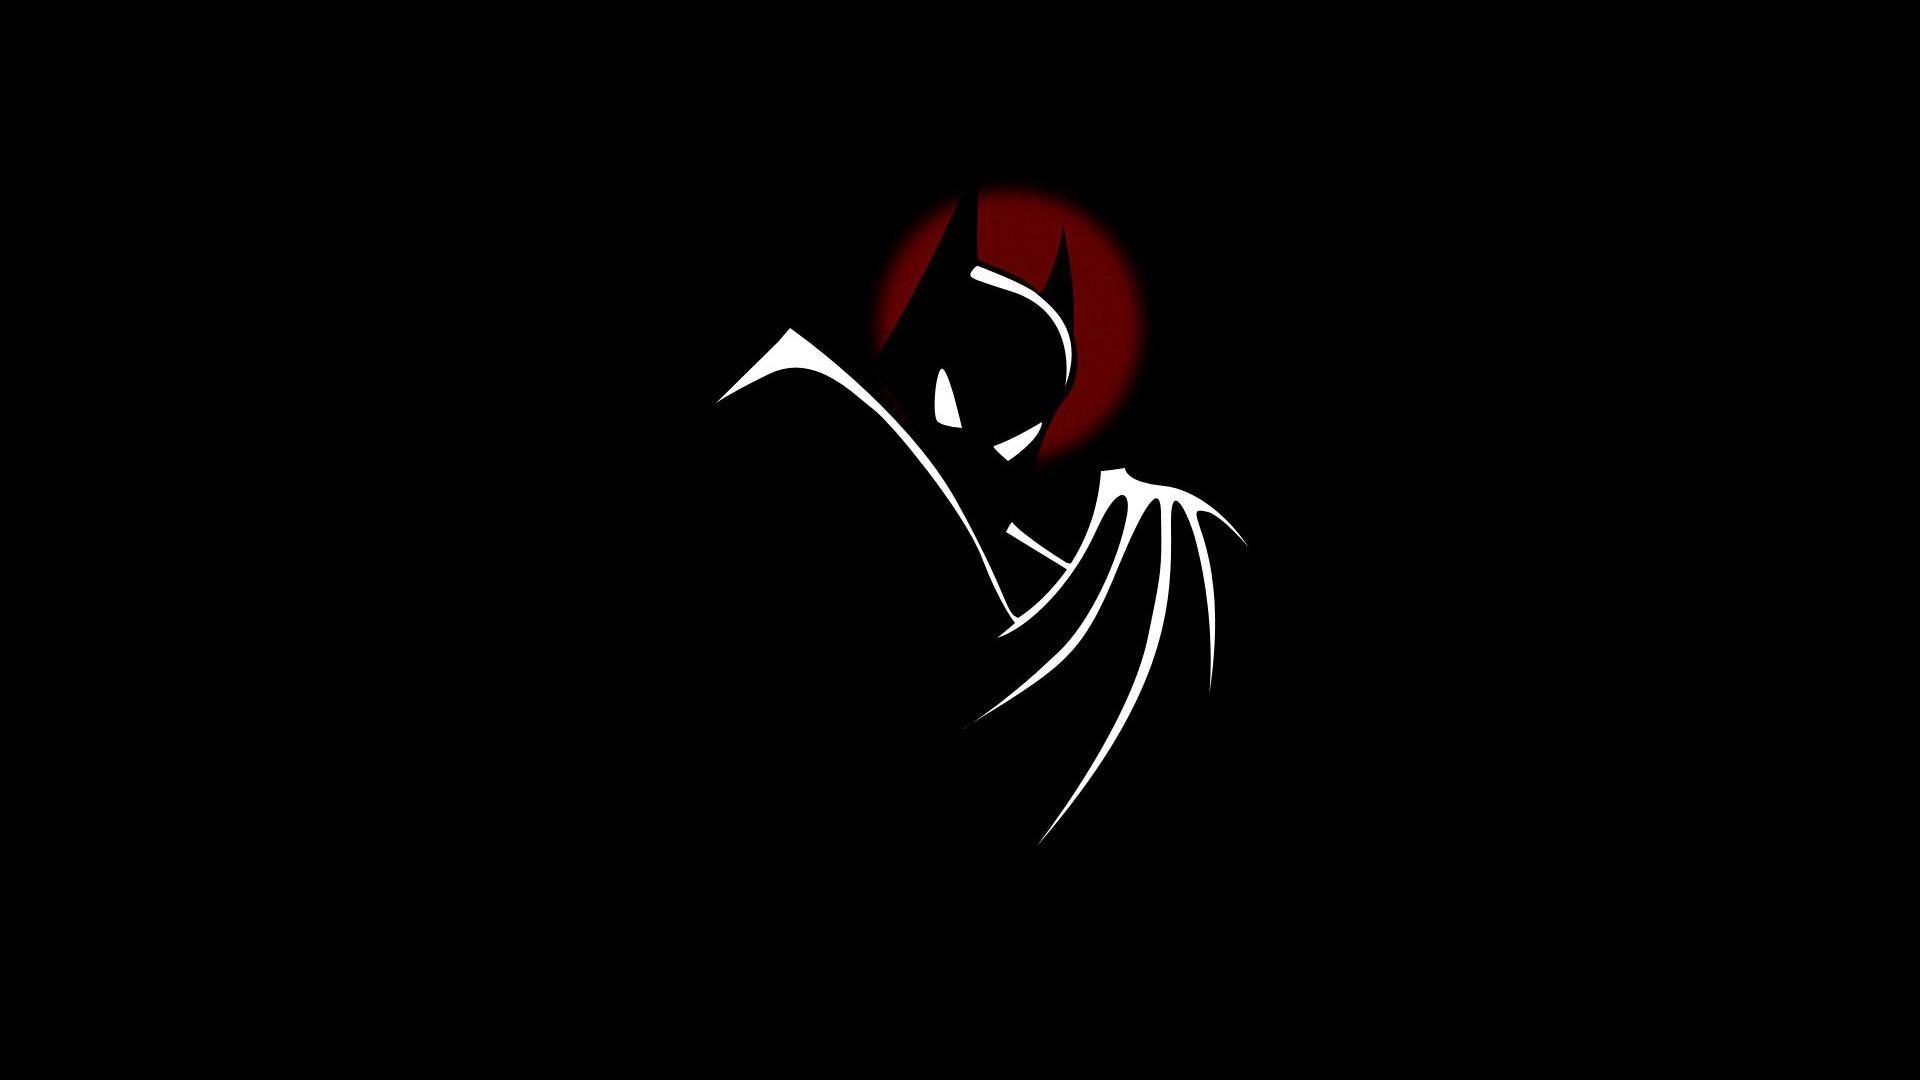 Batman Logo HD Wallpapers PixelsTalk Collection of Batman ...